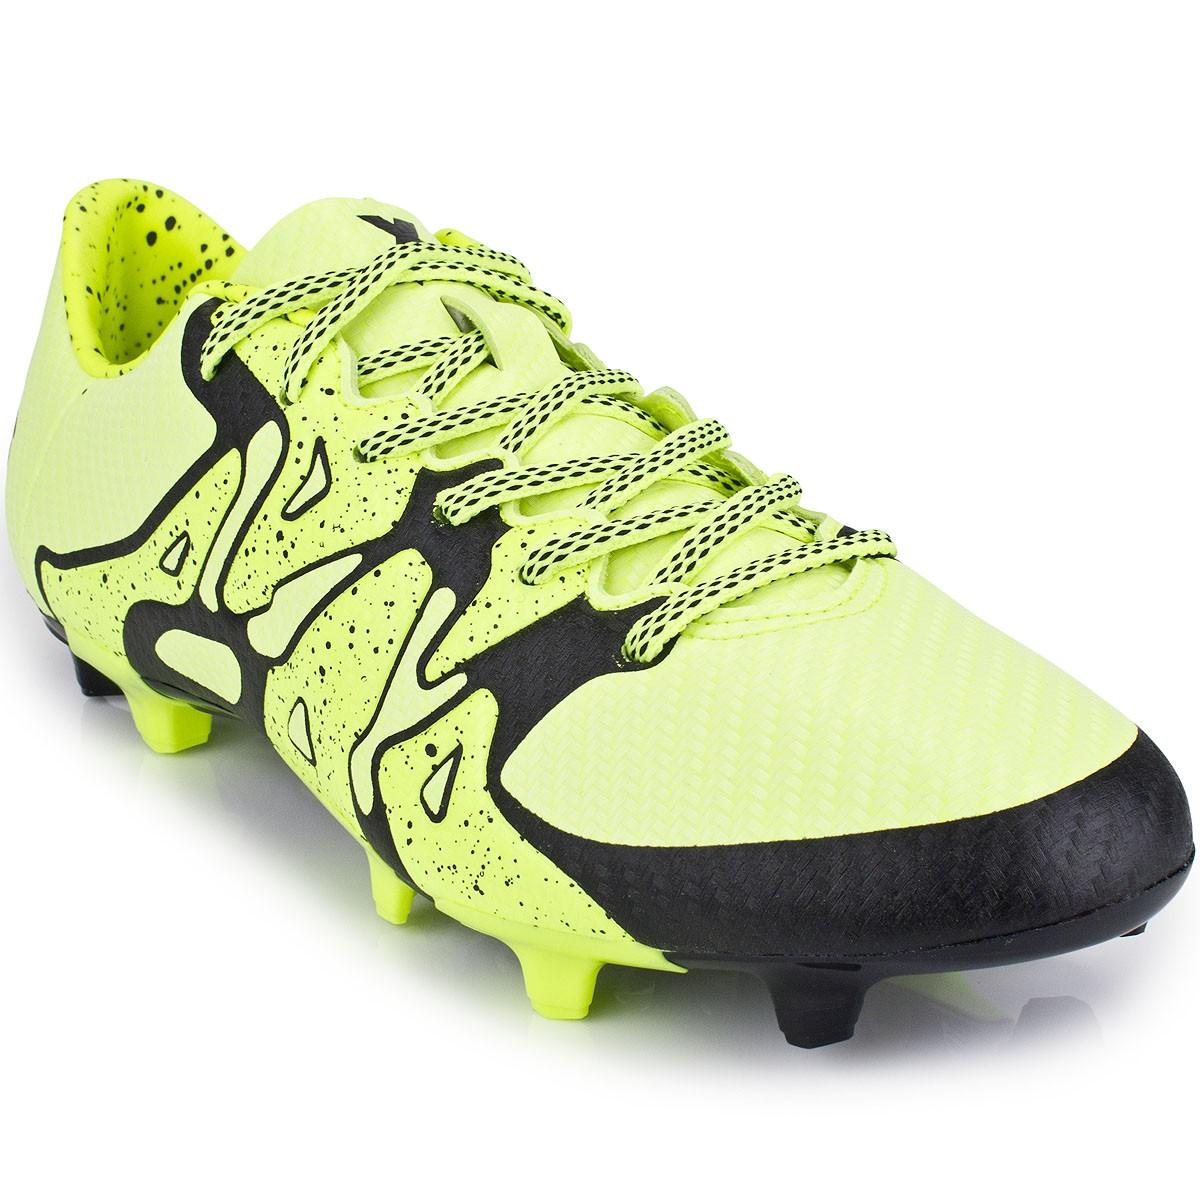 Chuteira Adidas X 15.3 FG B27001 4b2ac05e9a325